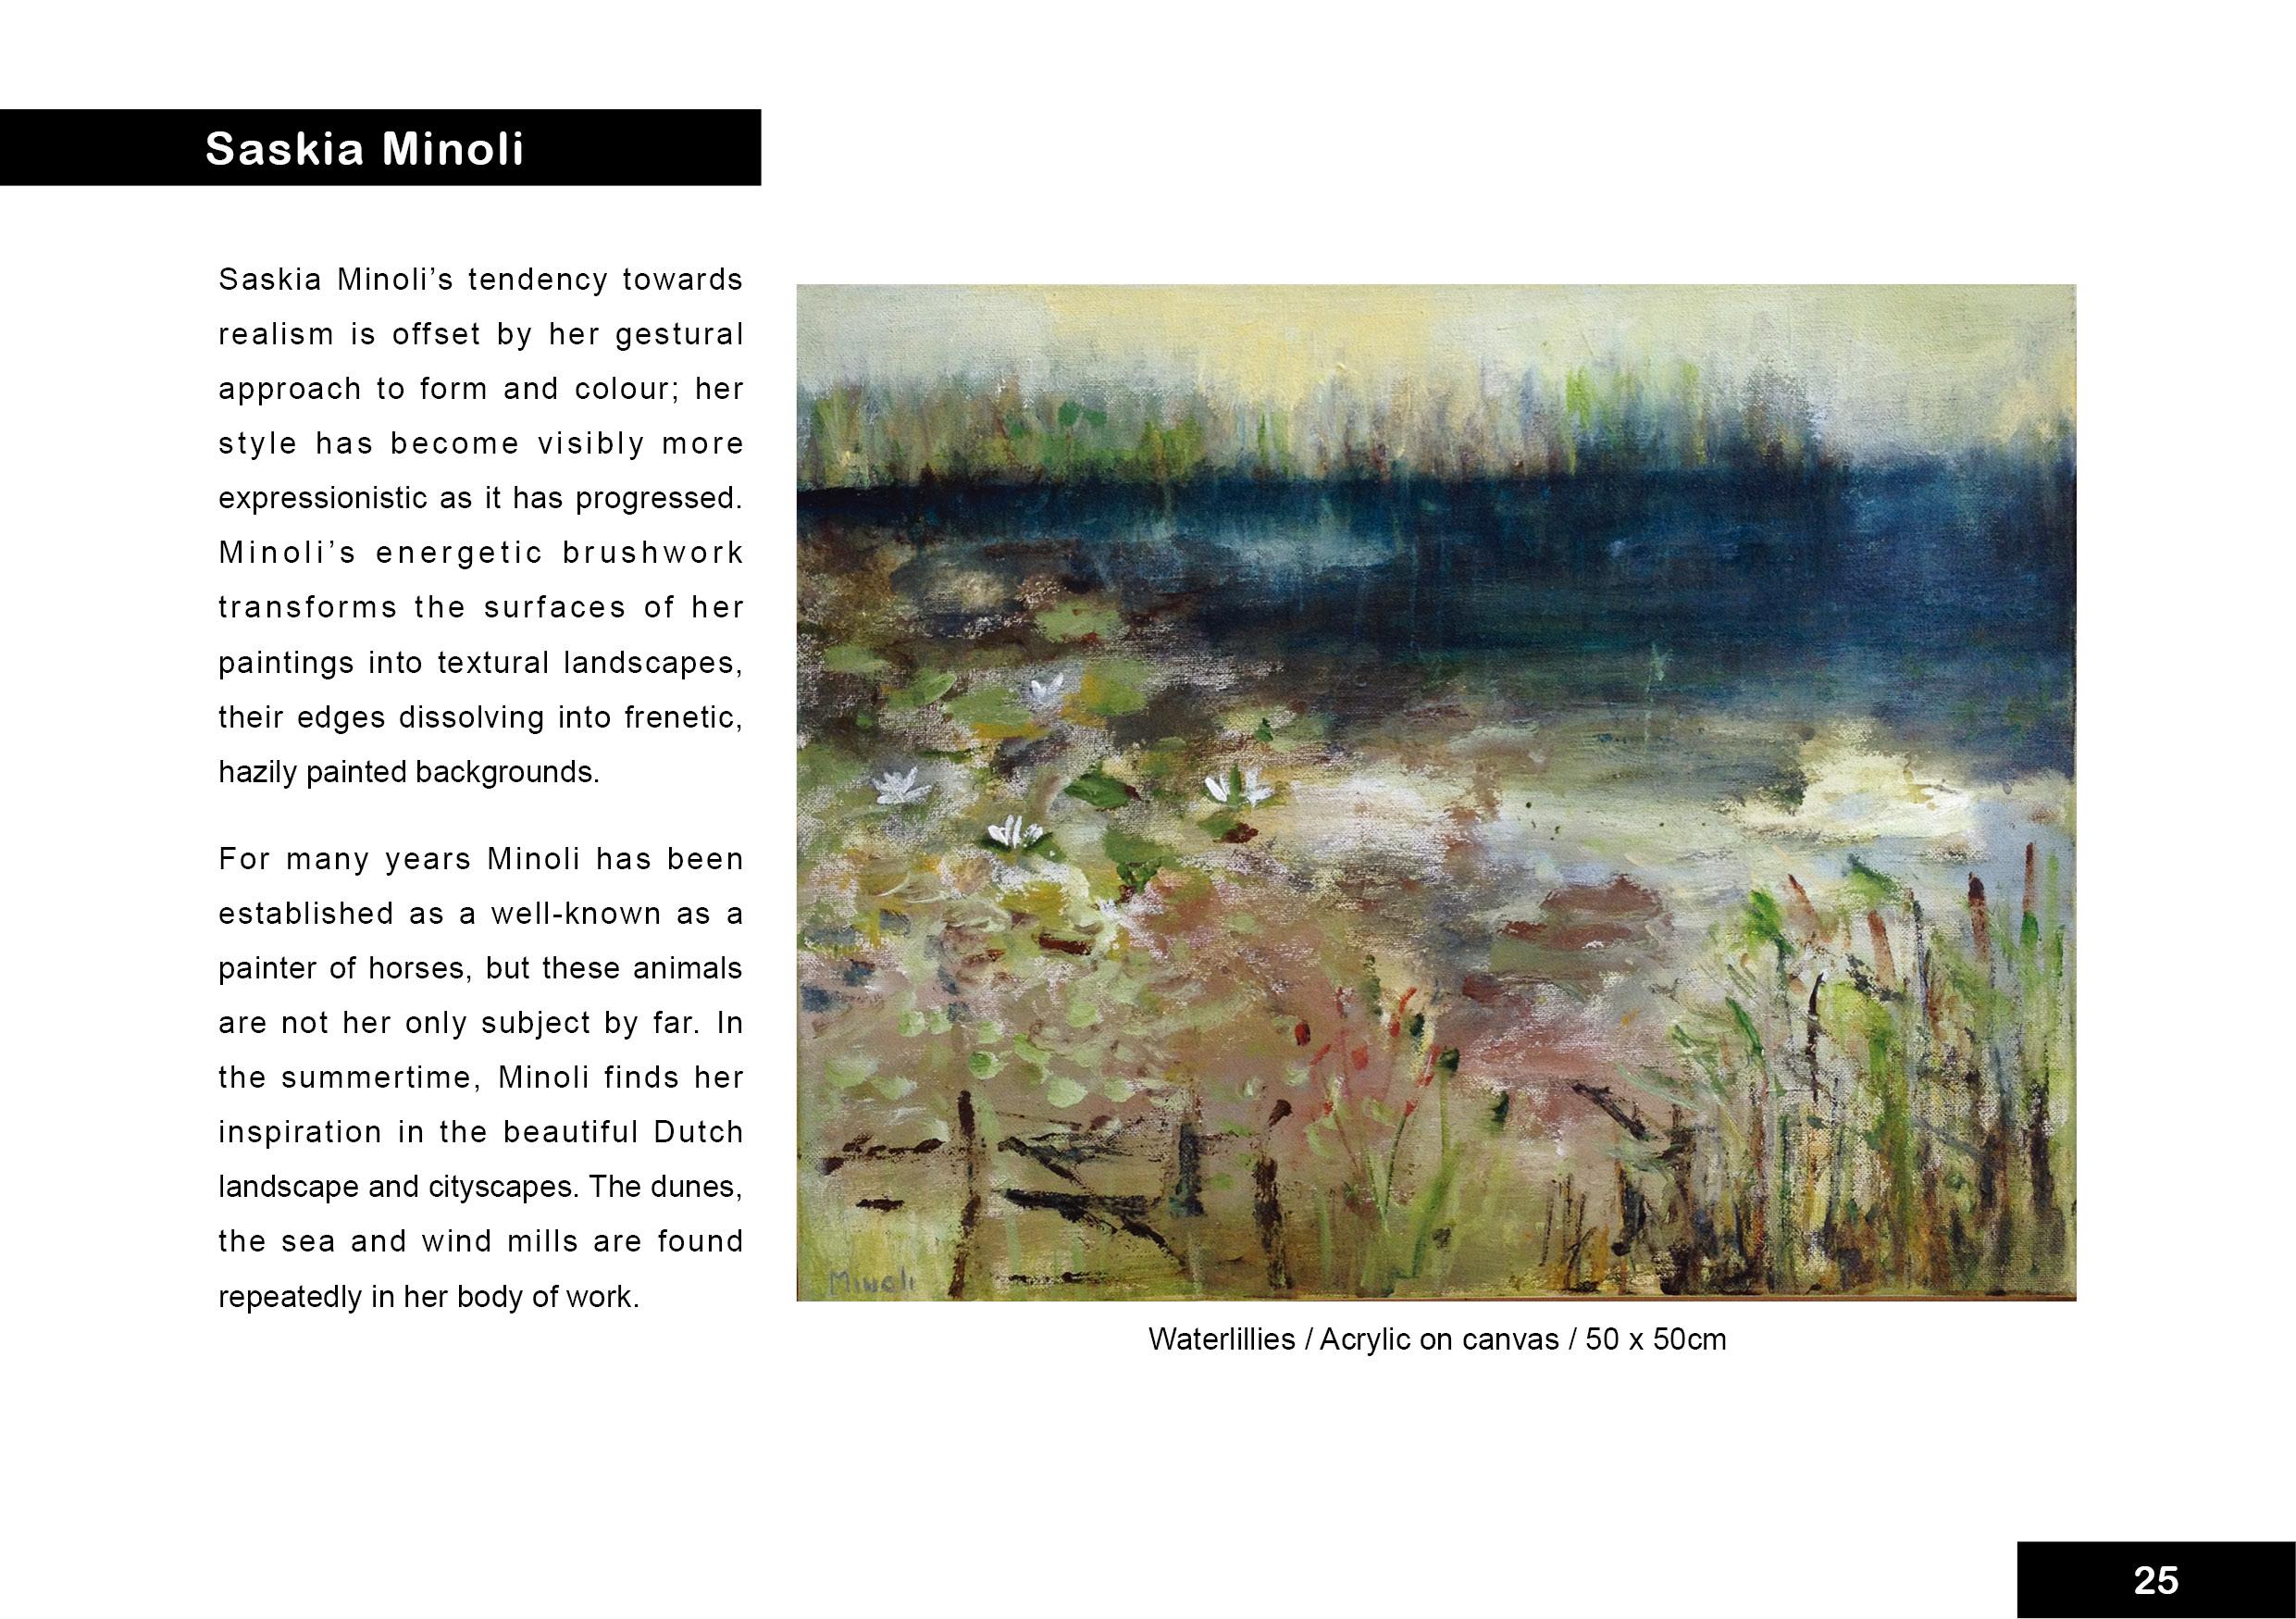 Catalog_page 25